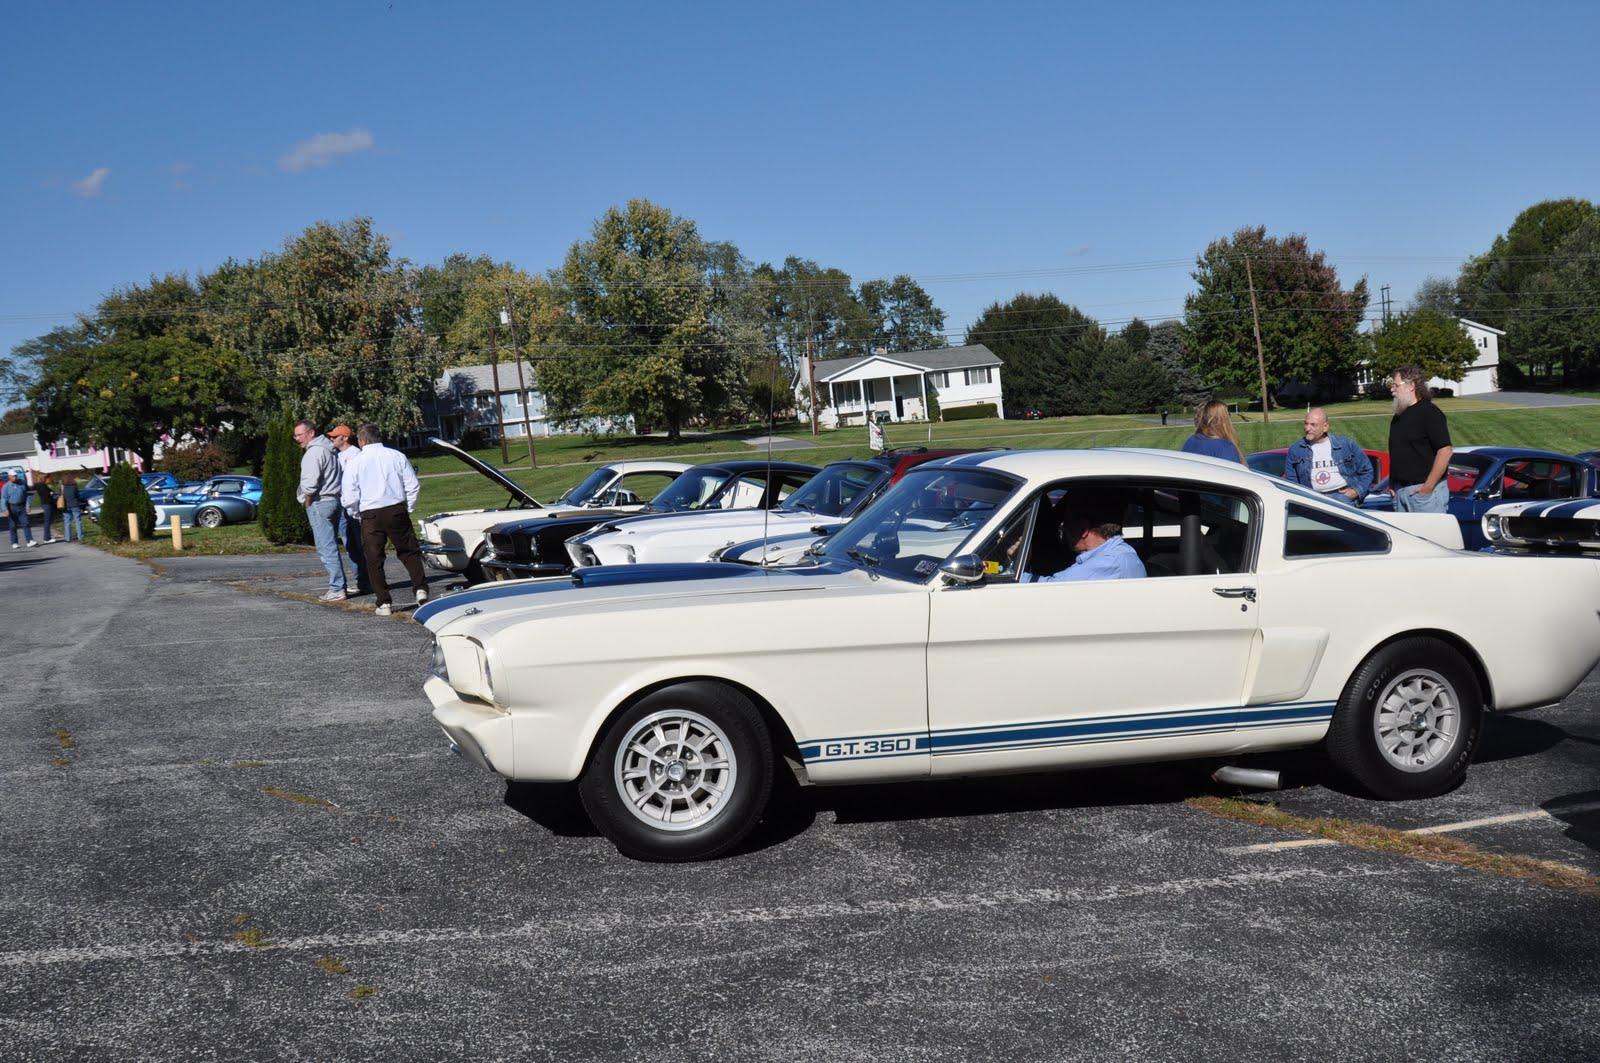 Virginia classic mustang blog northeast regional saac meet lots of cool cars in the parking lot fandeluxe Images